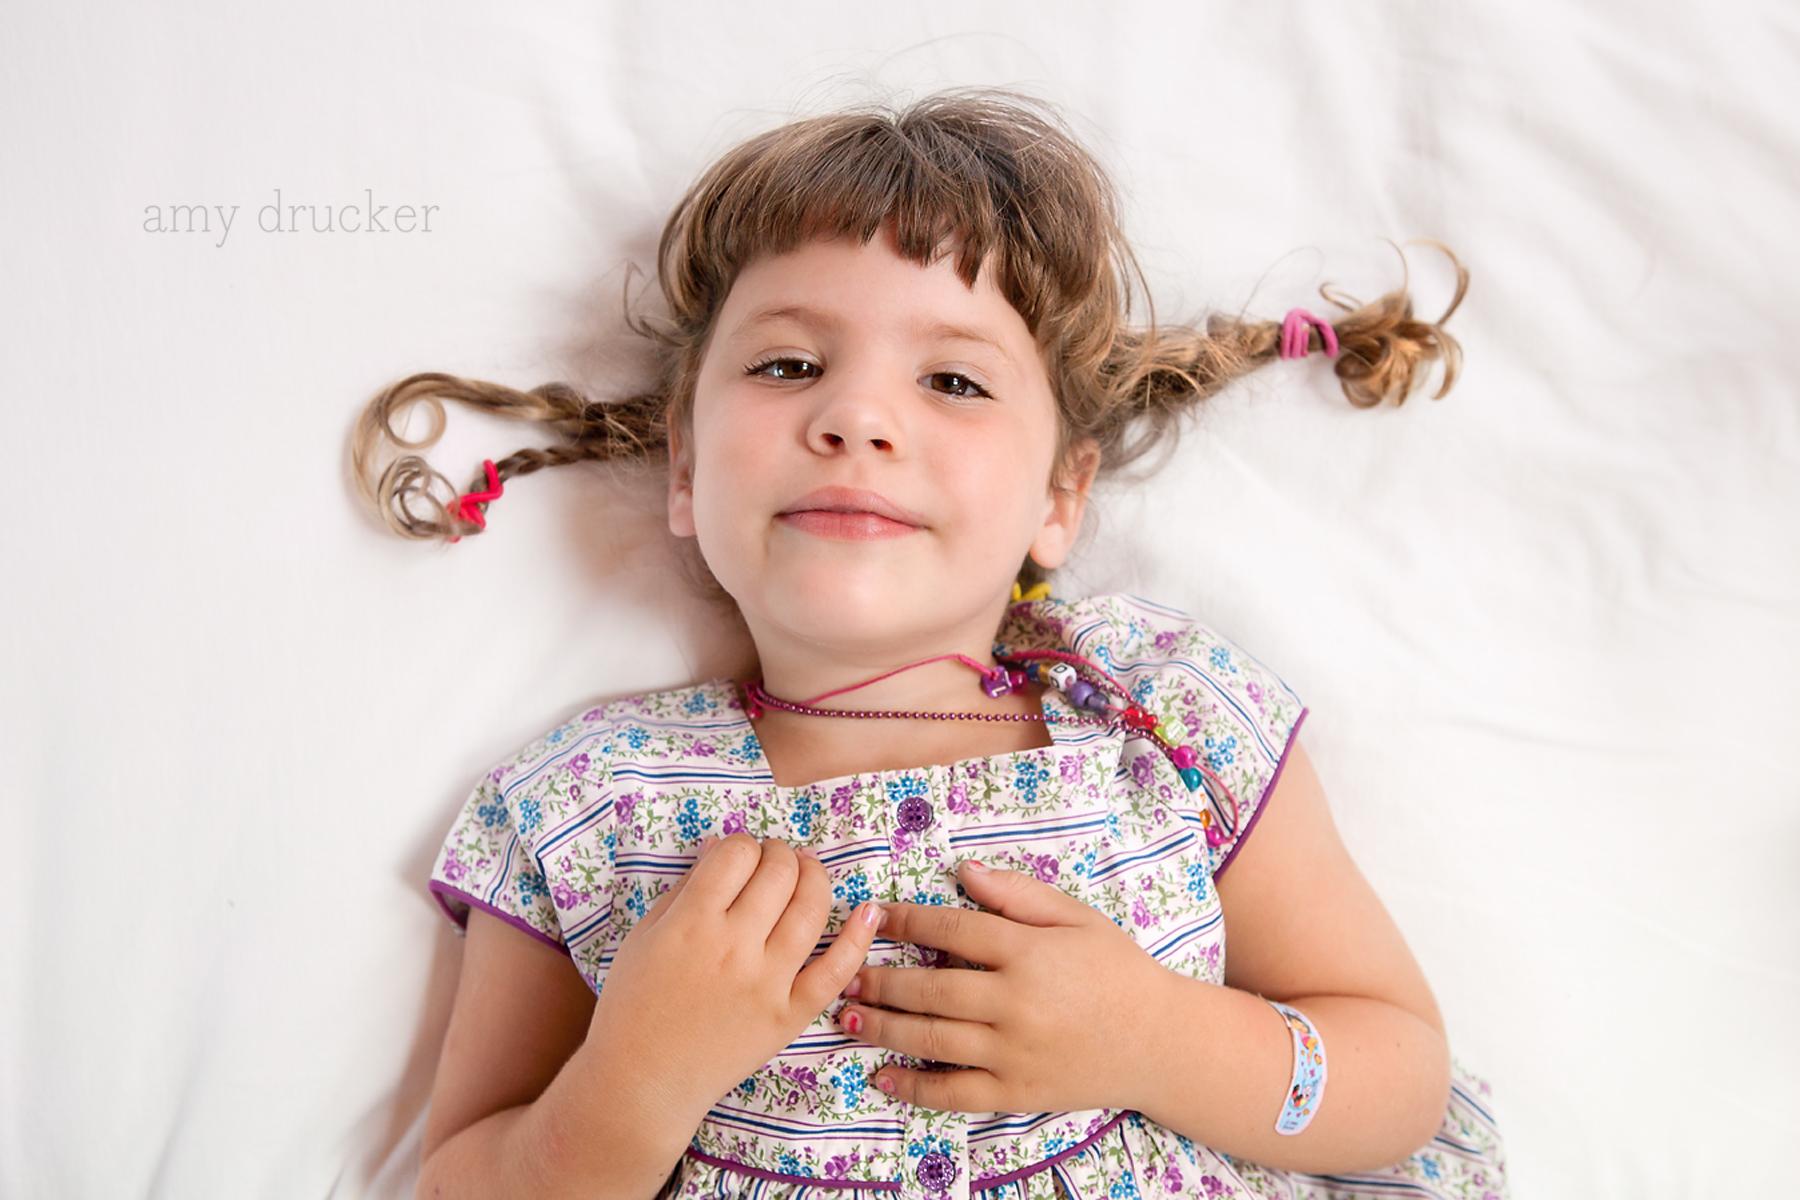 marthas_vineyard_child_photographer_amy_drucker_1